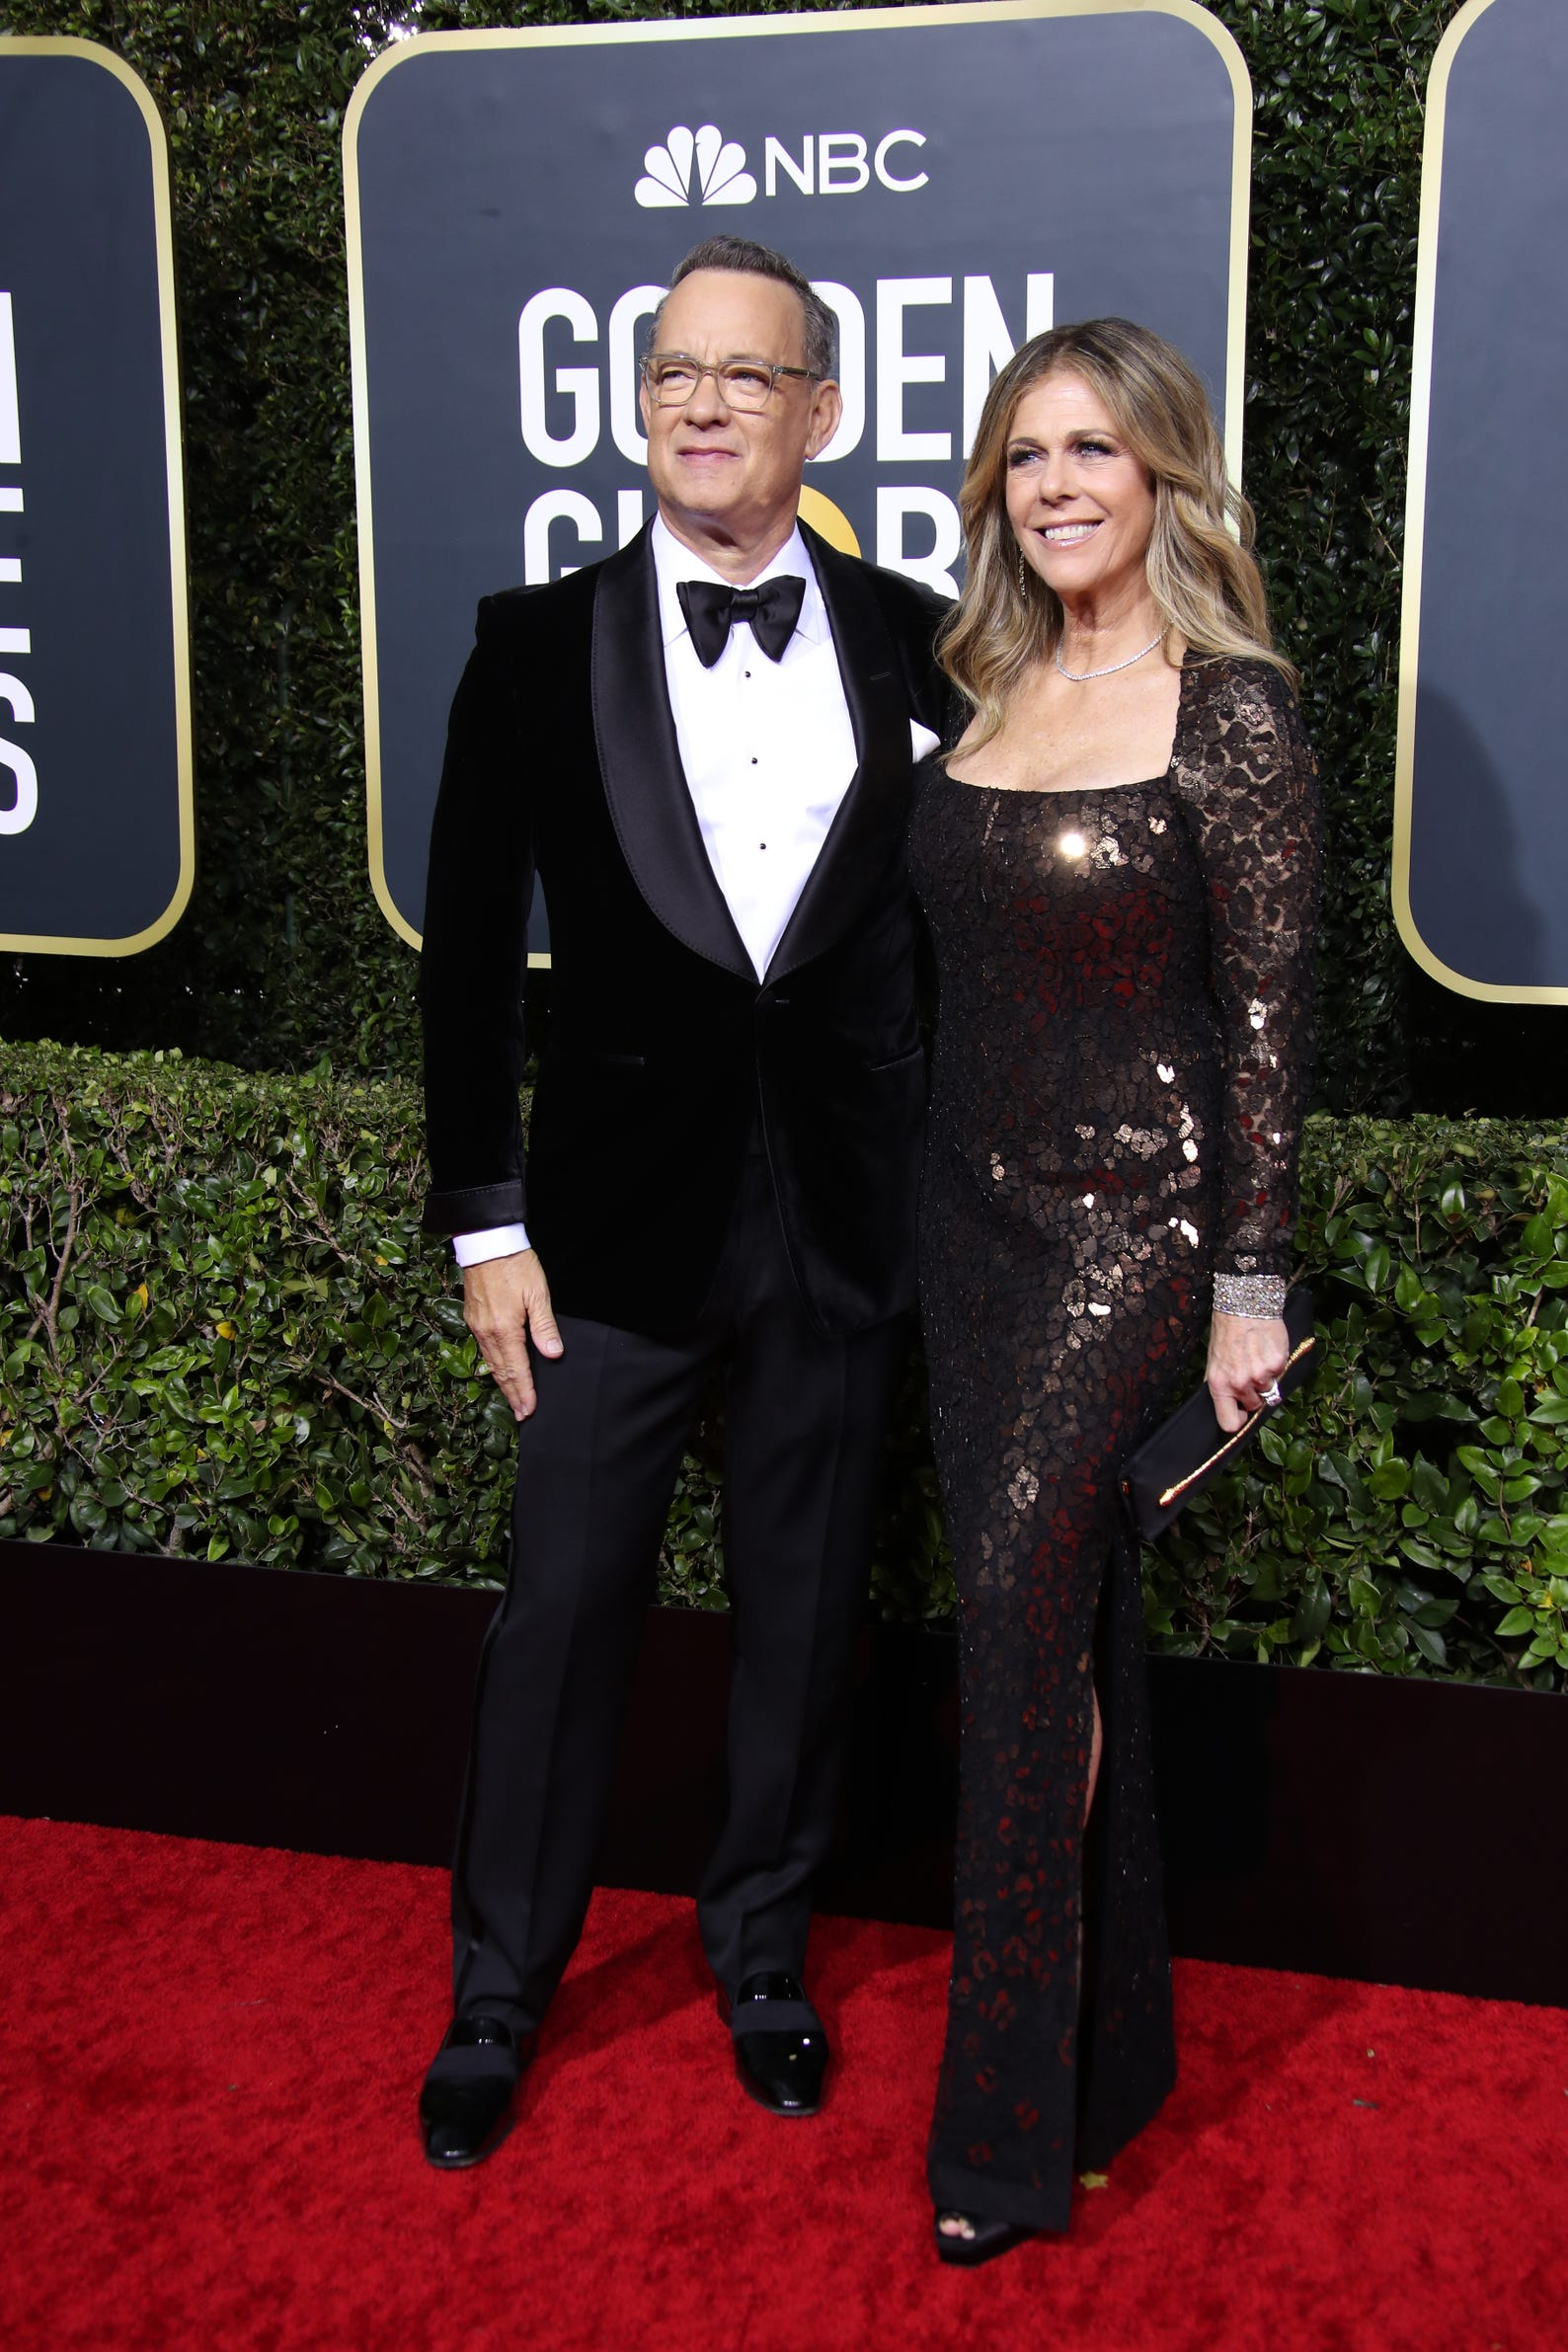 Tom Hanks, left, and Rita Wilson